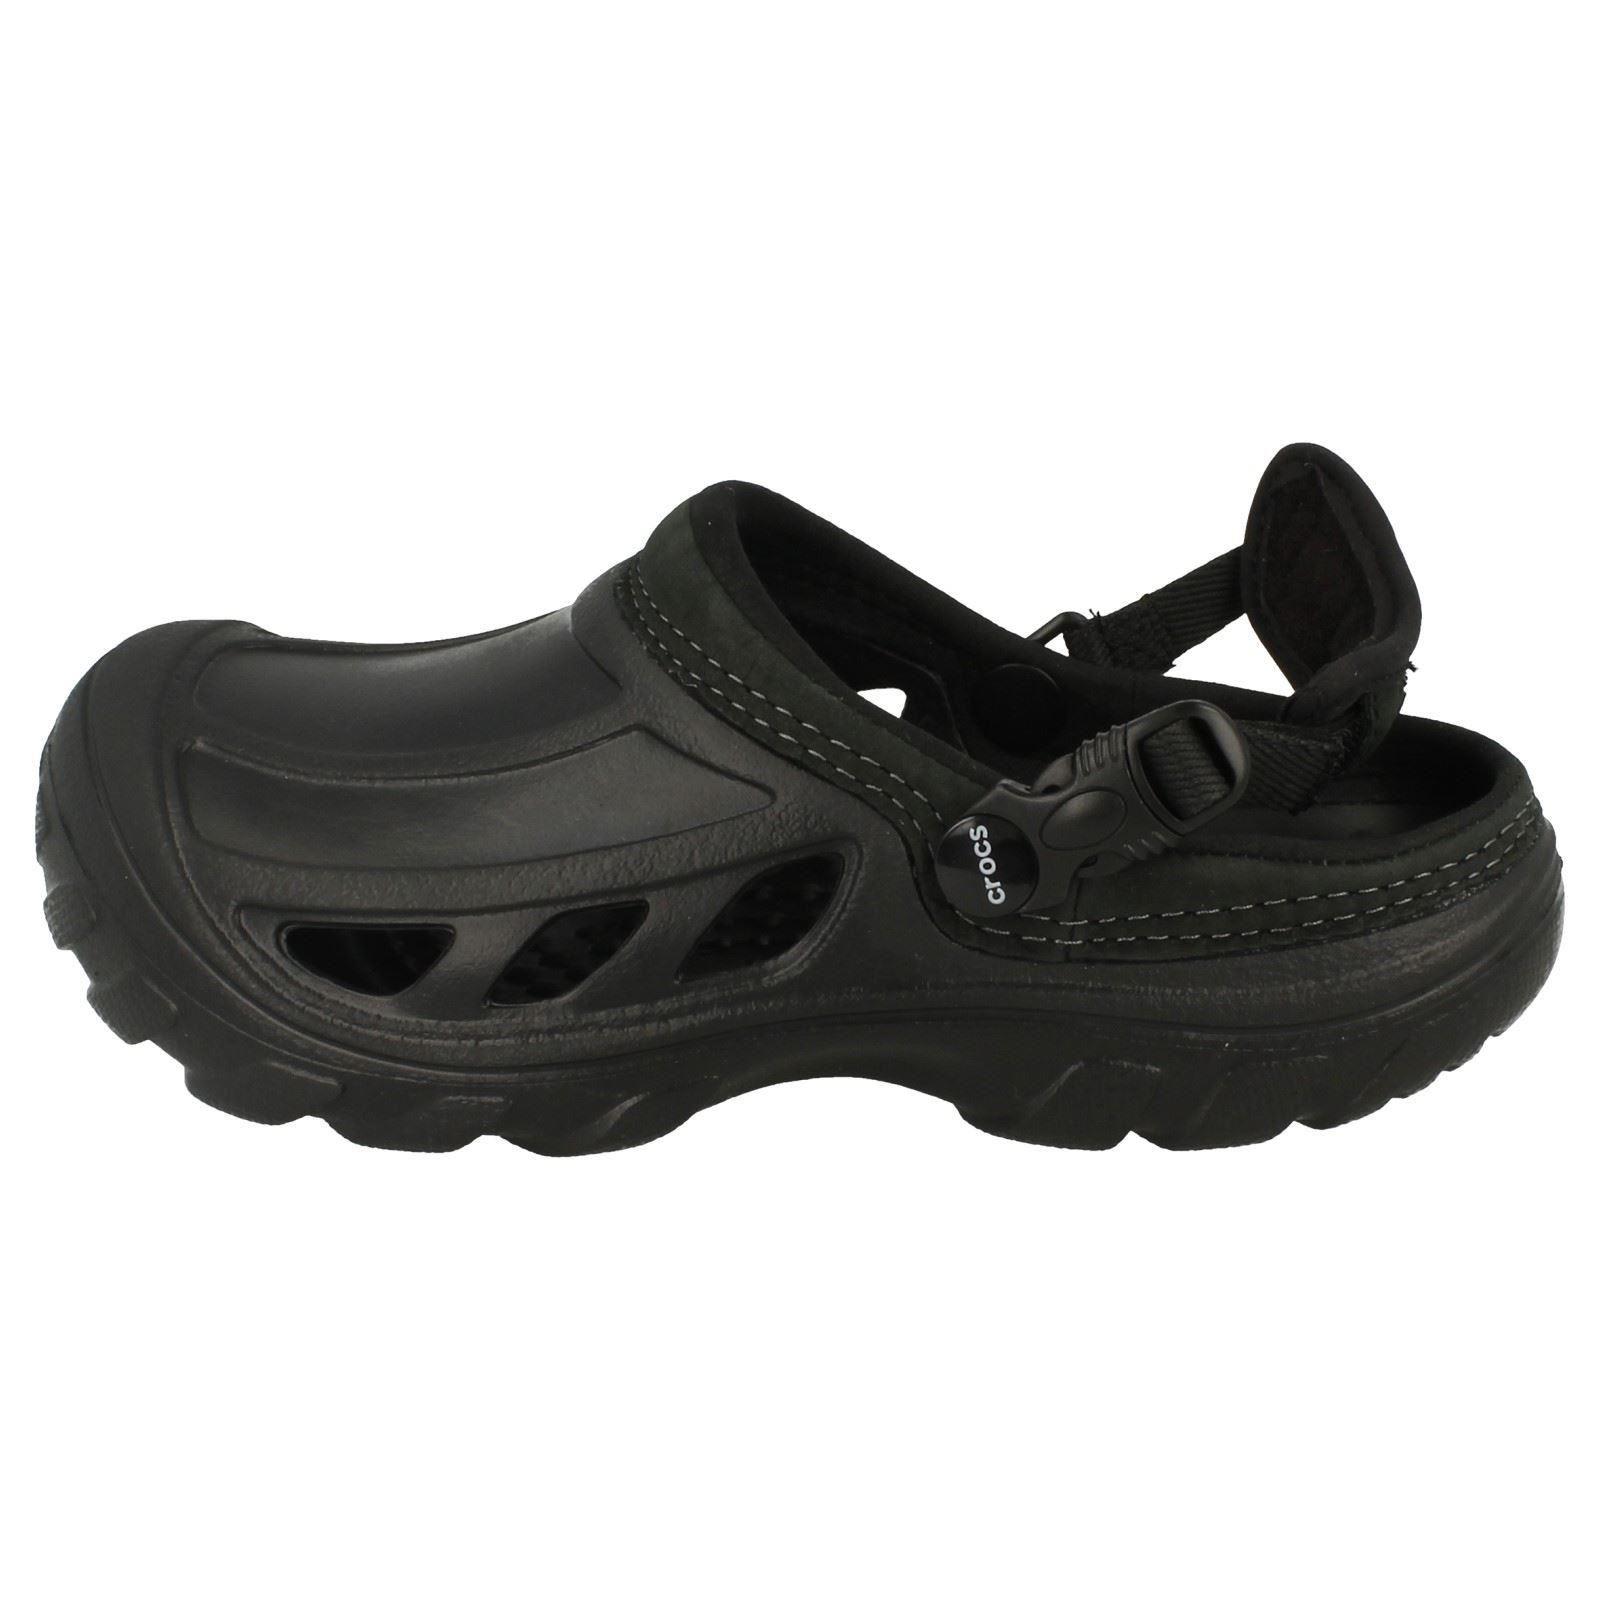 Mens Crocs Slip On Clogs Crostrail Men | eBay - photo#48